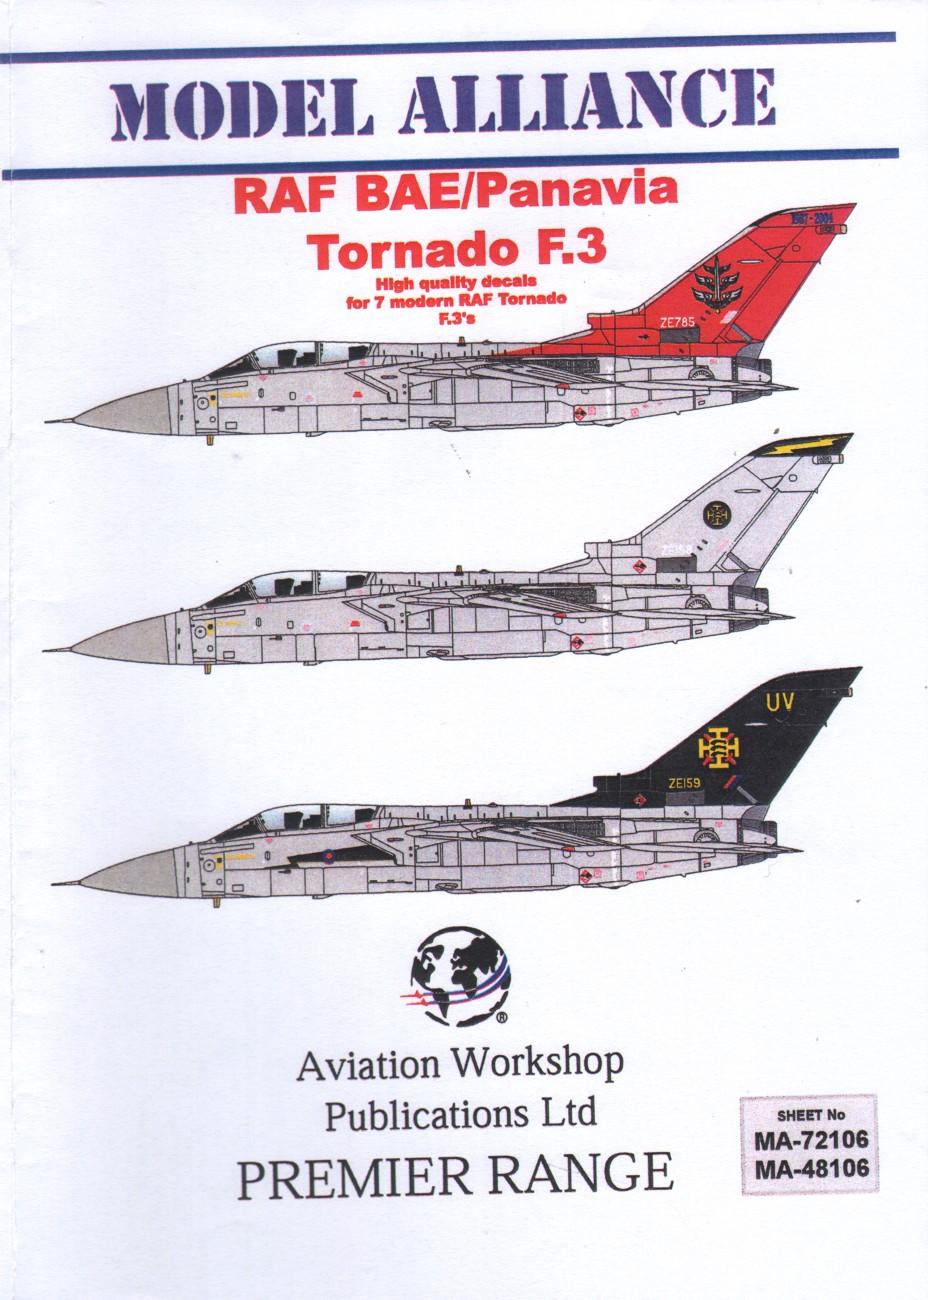 48106 Panavia Tornado F.3